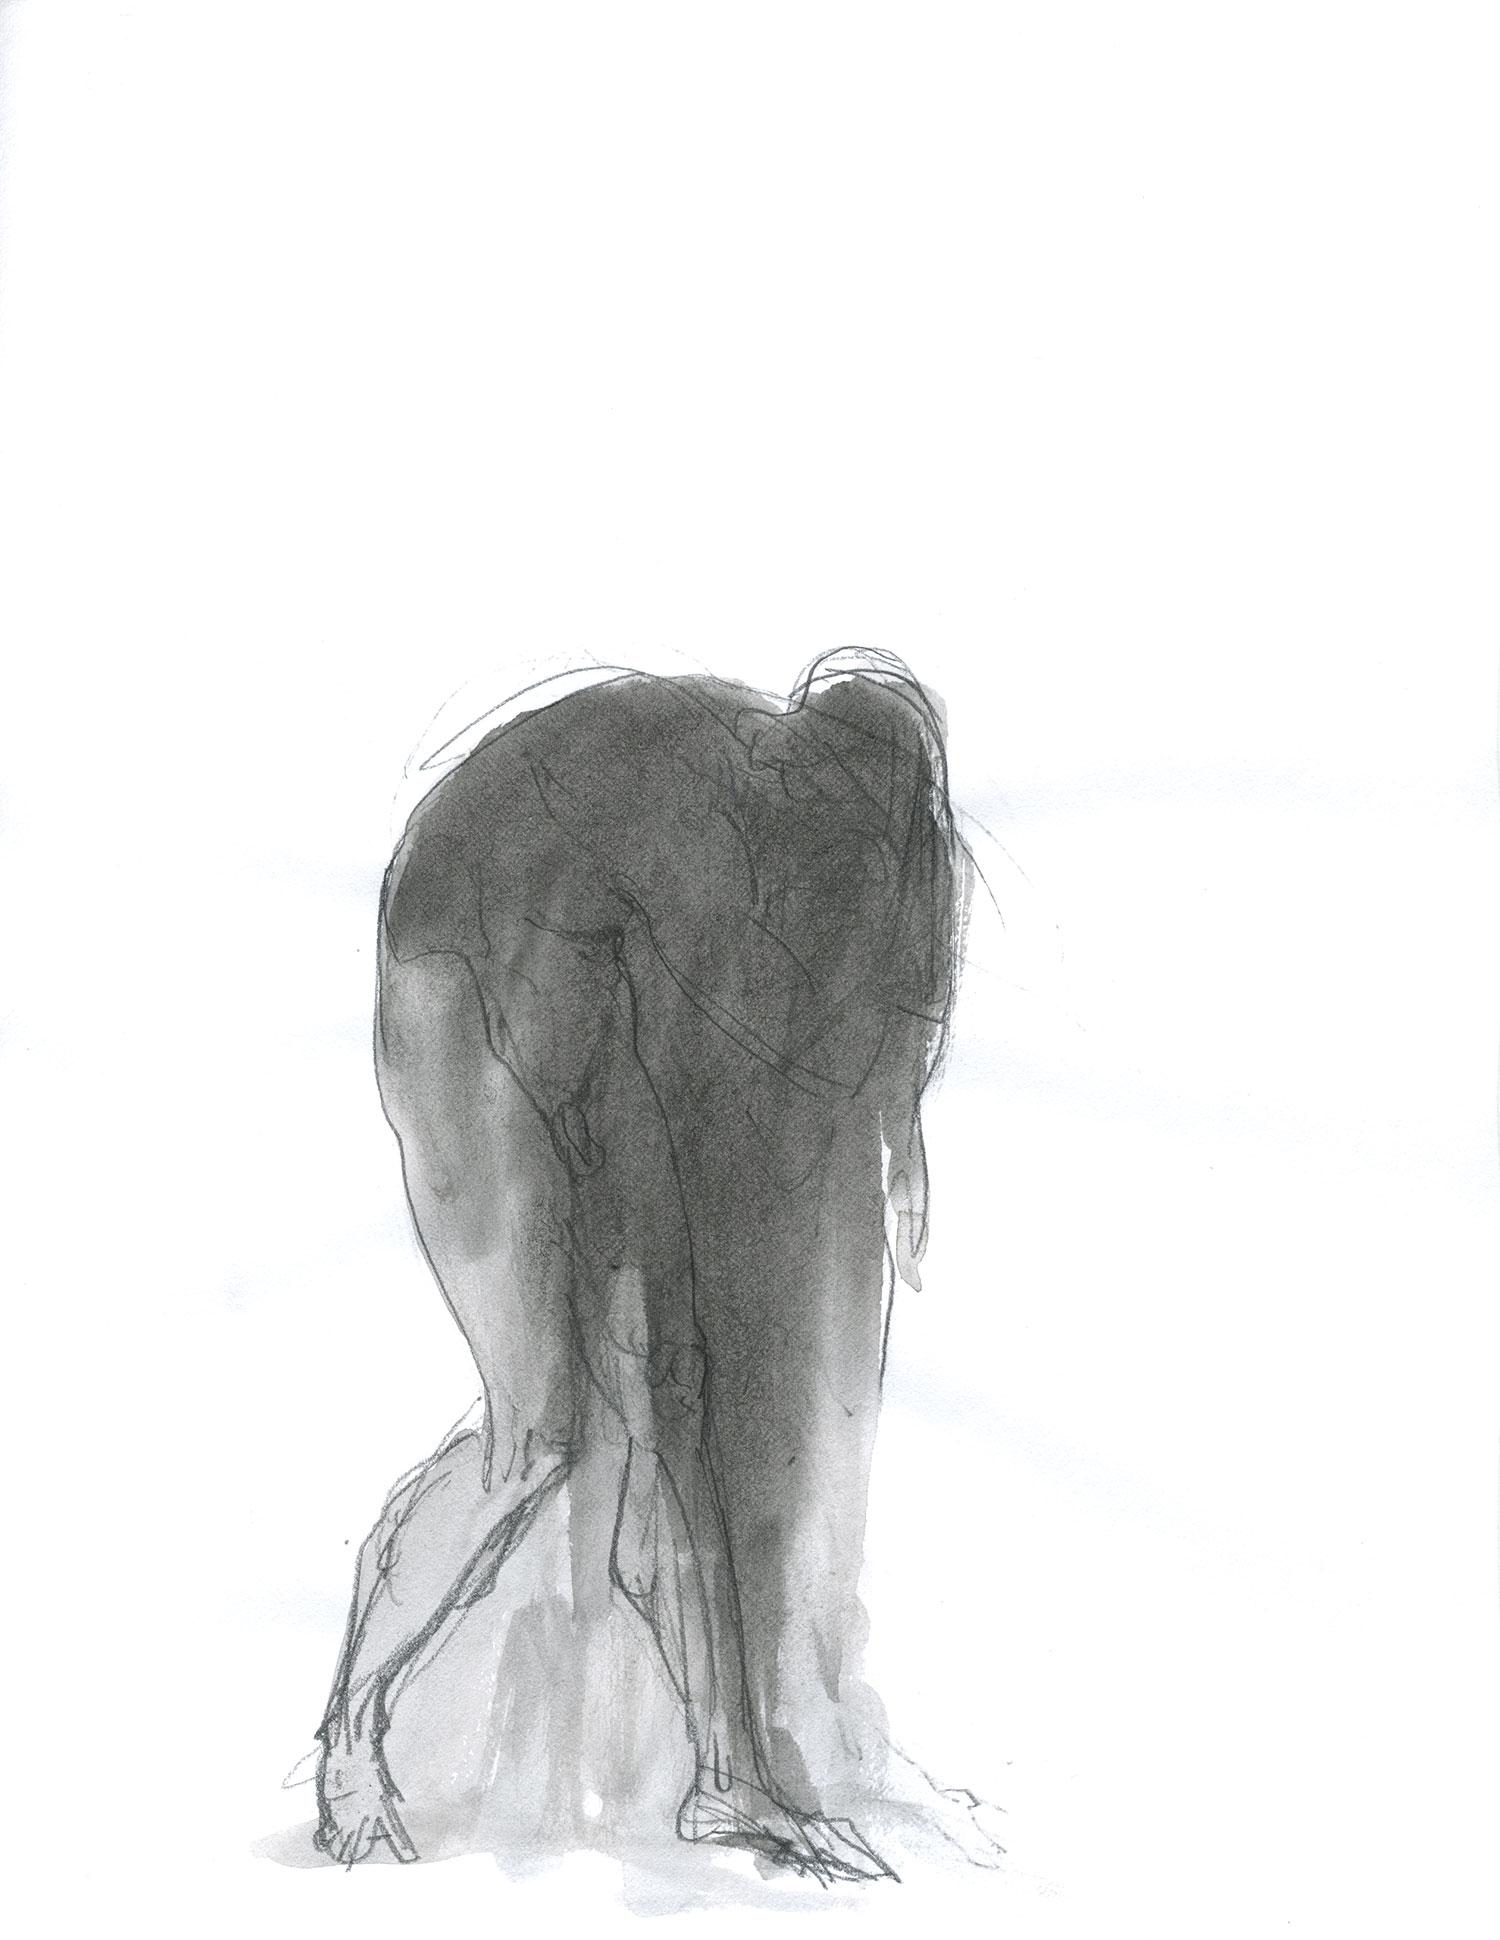 "Lament  2015, Ink on paper, 11"" x 8 1/2"" © Leonard Porter MMXV"